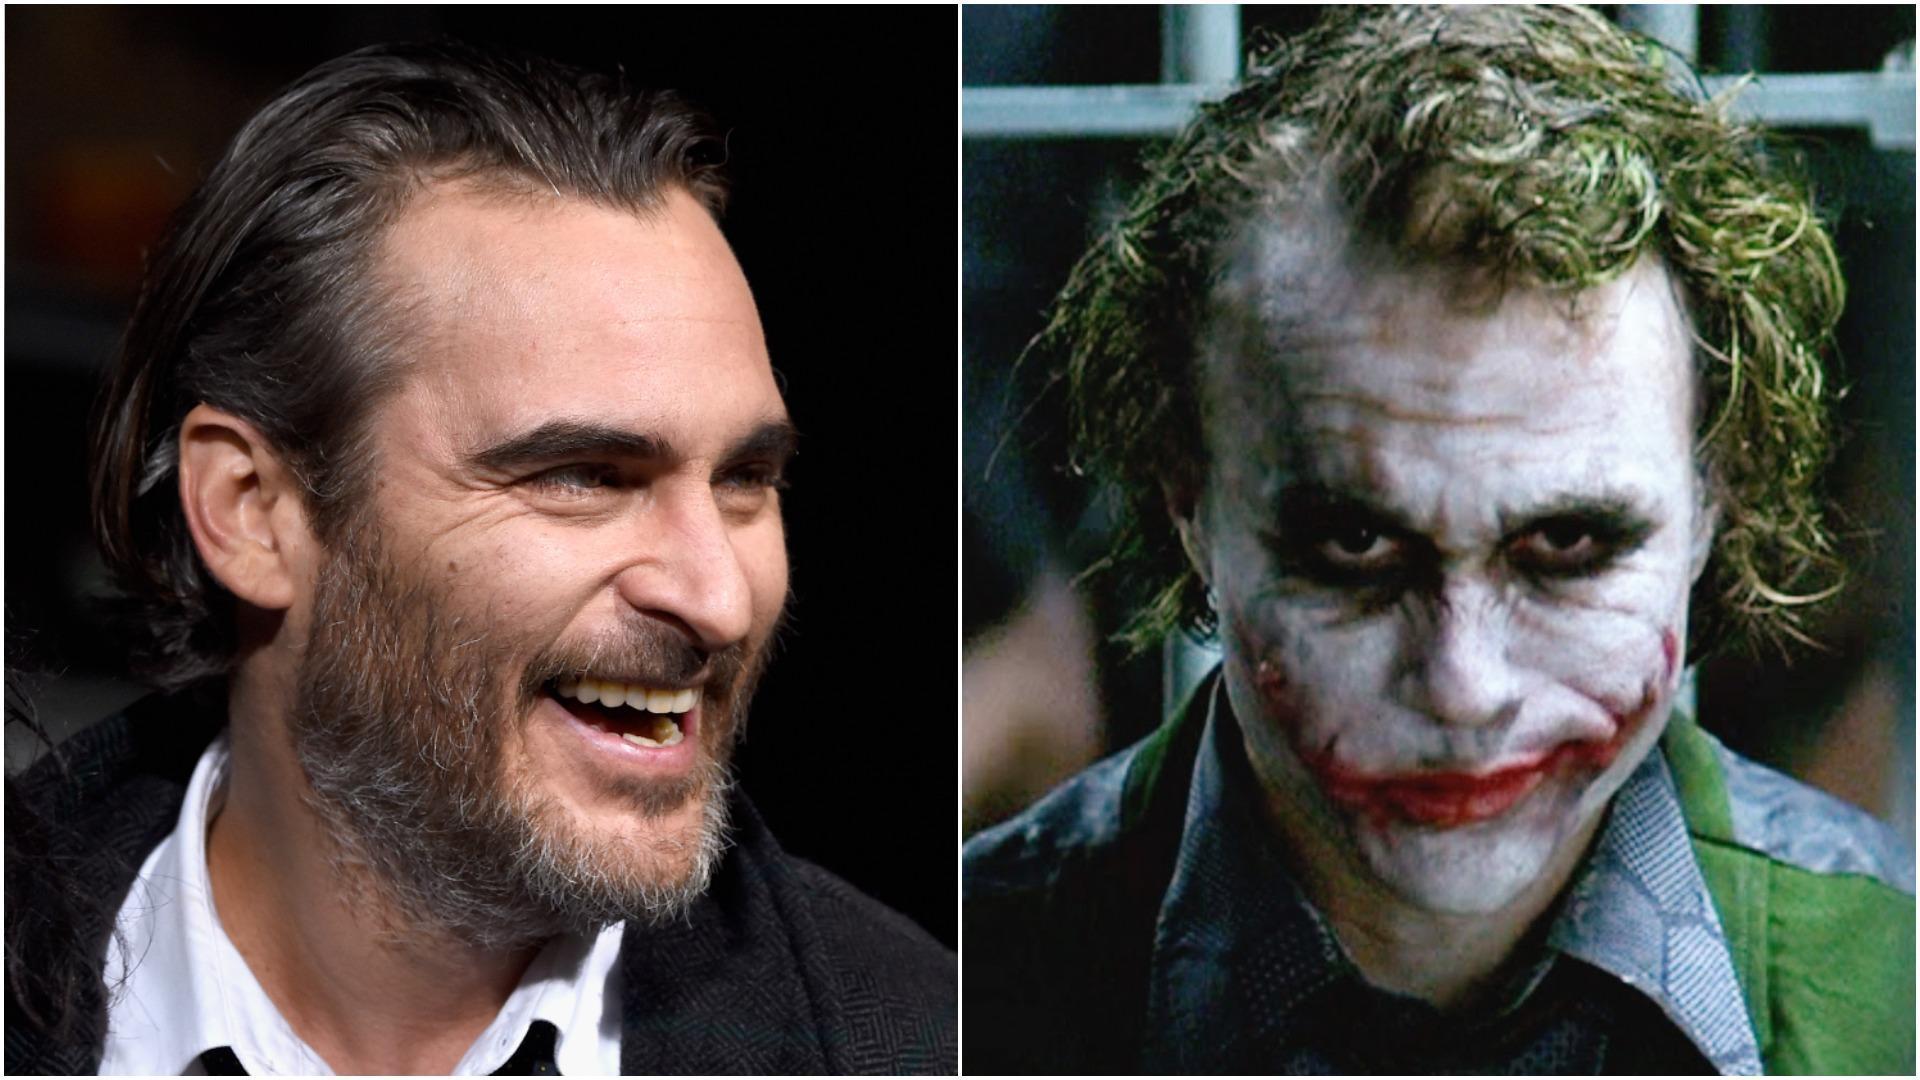 Joker origins: Joaquin Phoenix in talks to play titular villain in Martin Scorsese-produced DC movie